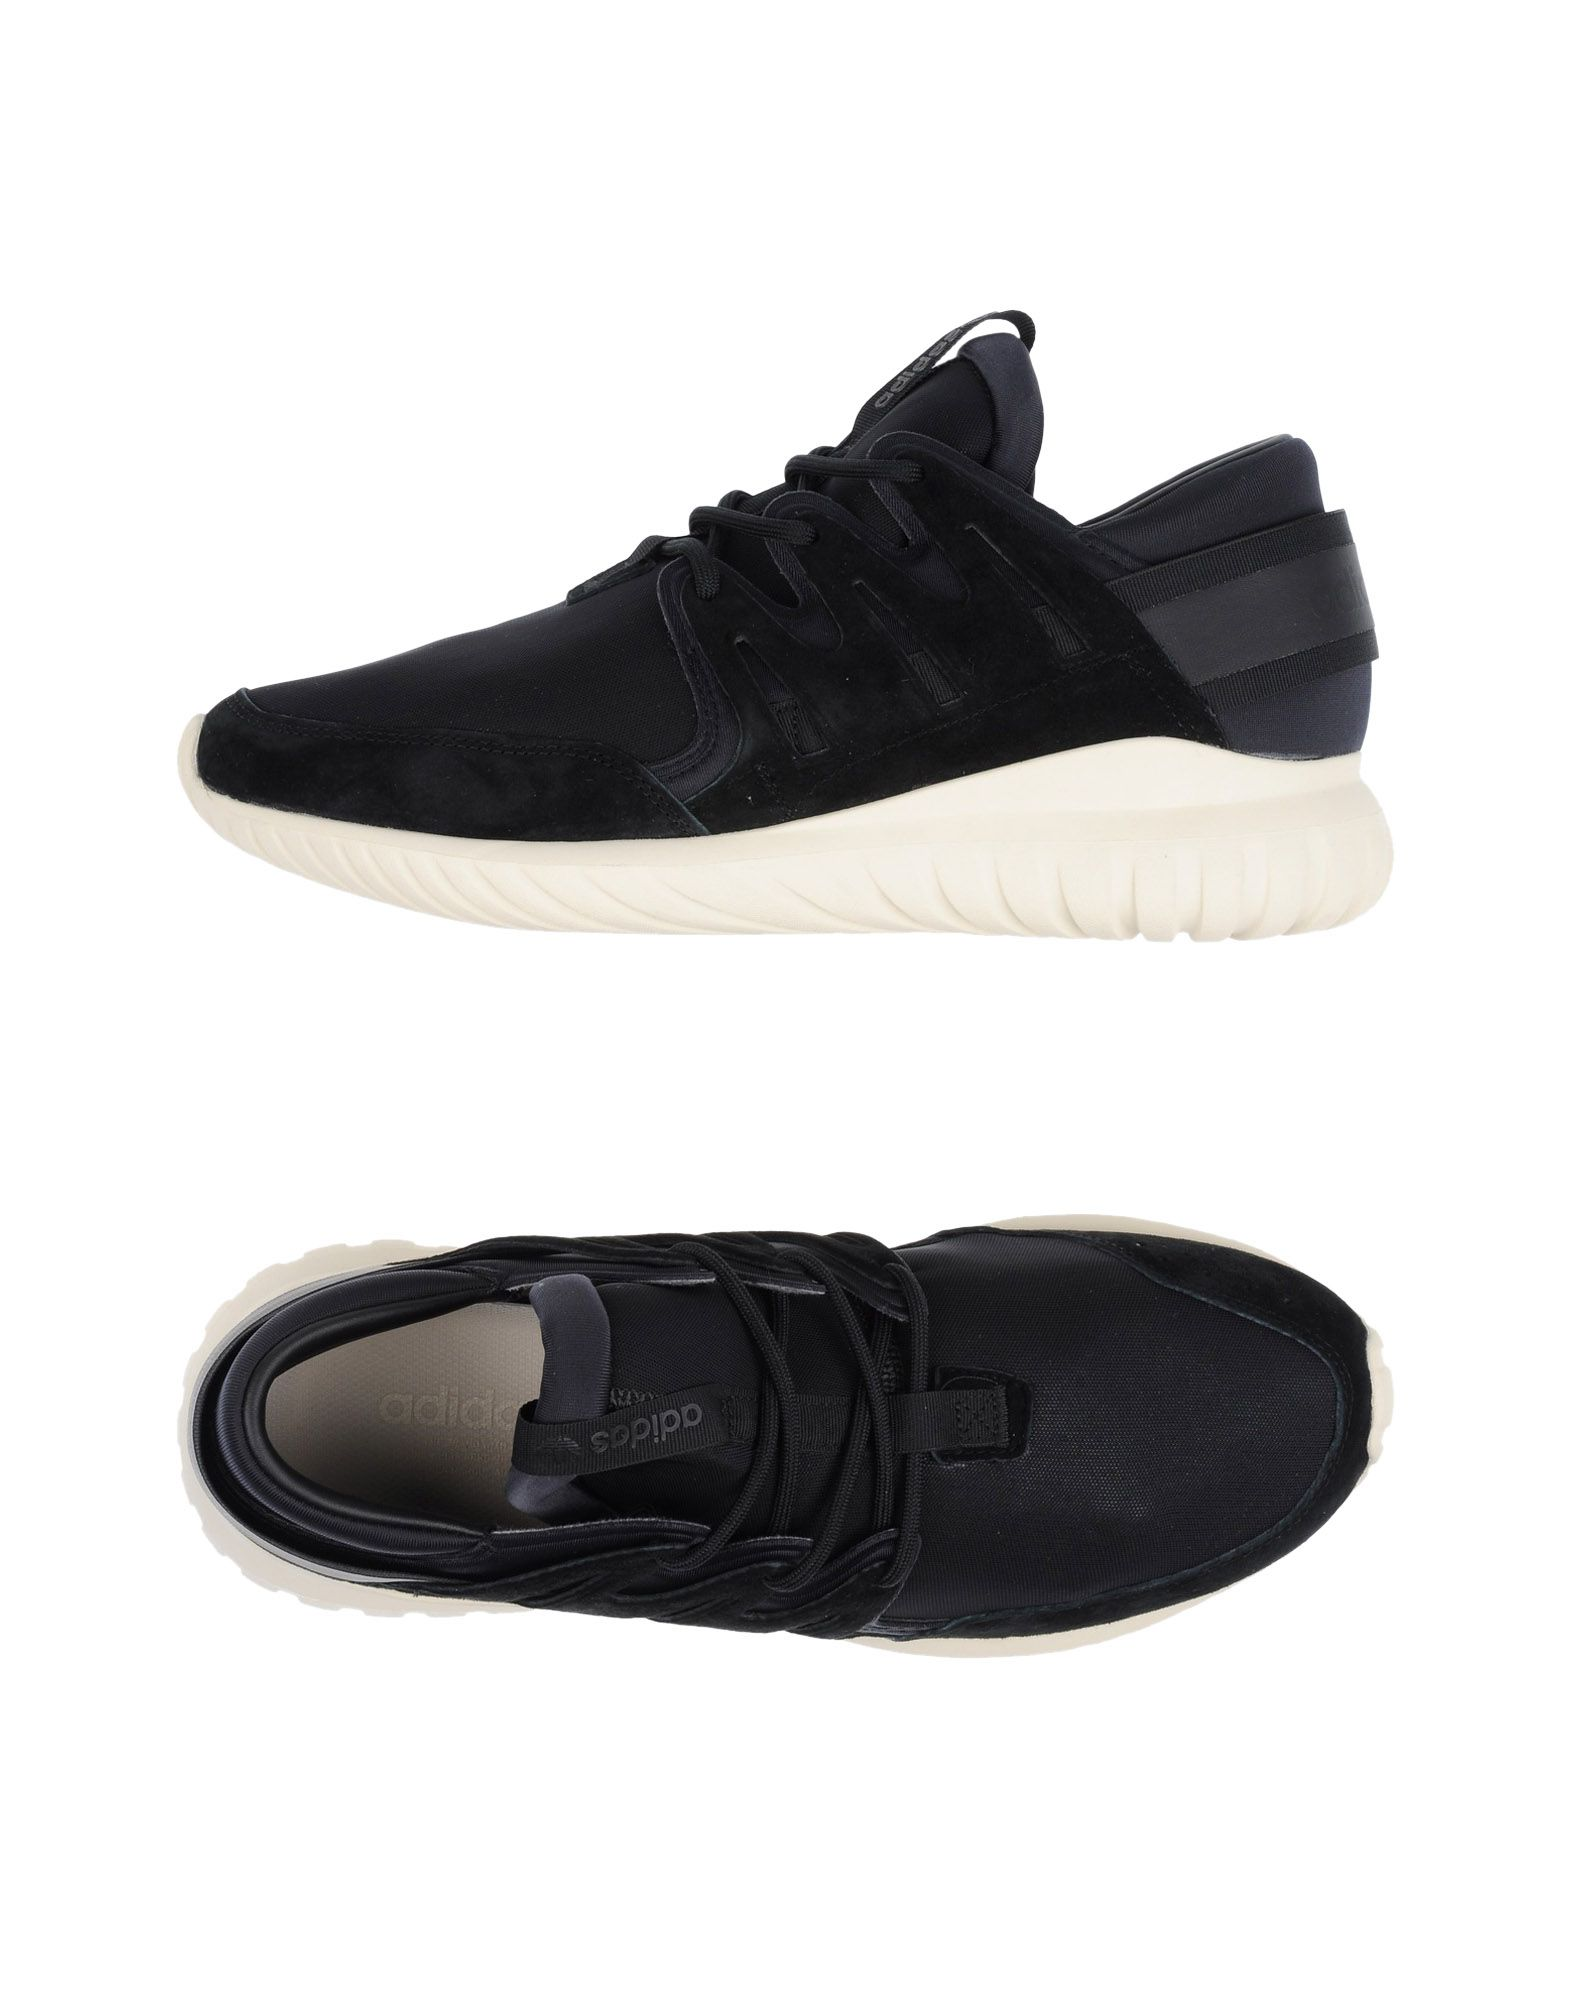 Sneakers Adidas Originals Uomo - 11251142DG